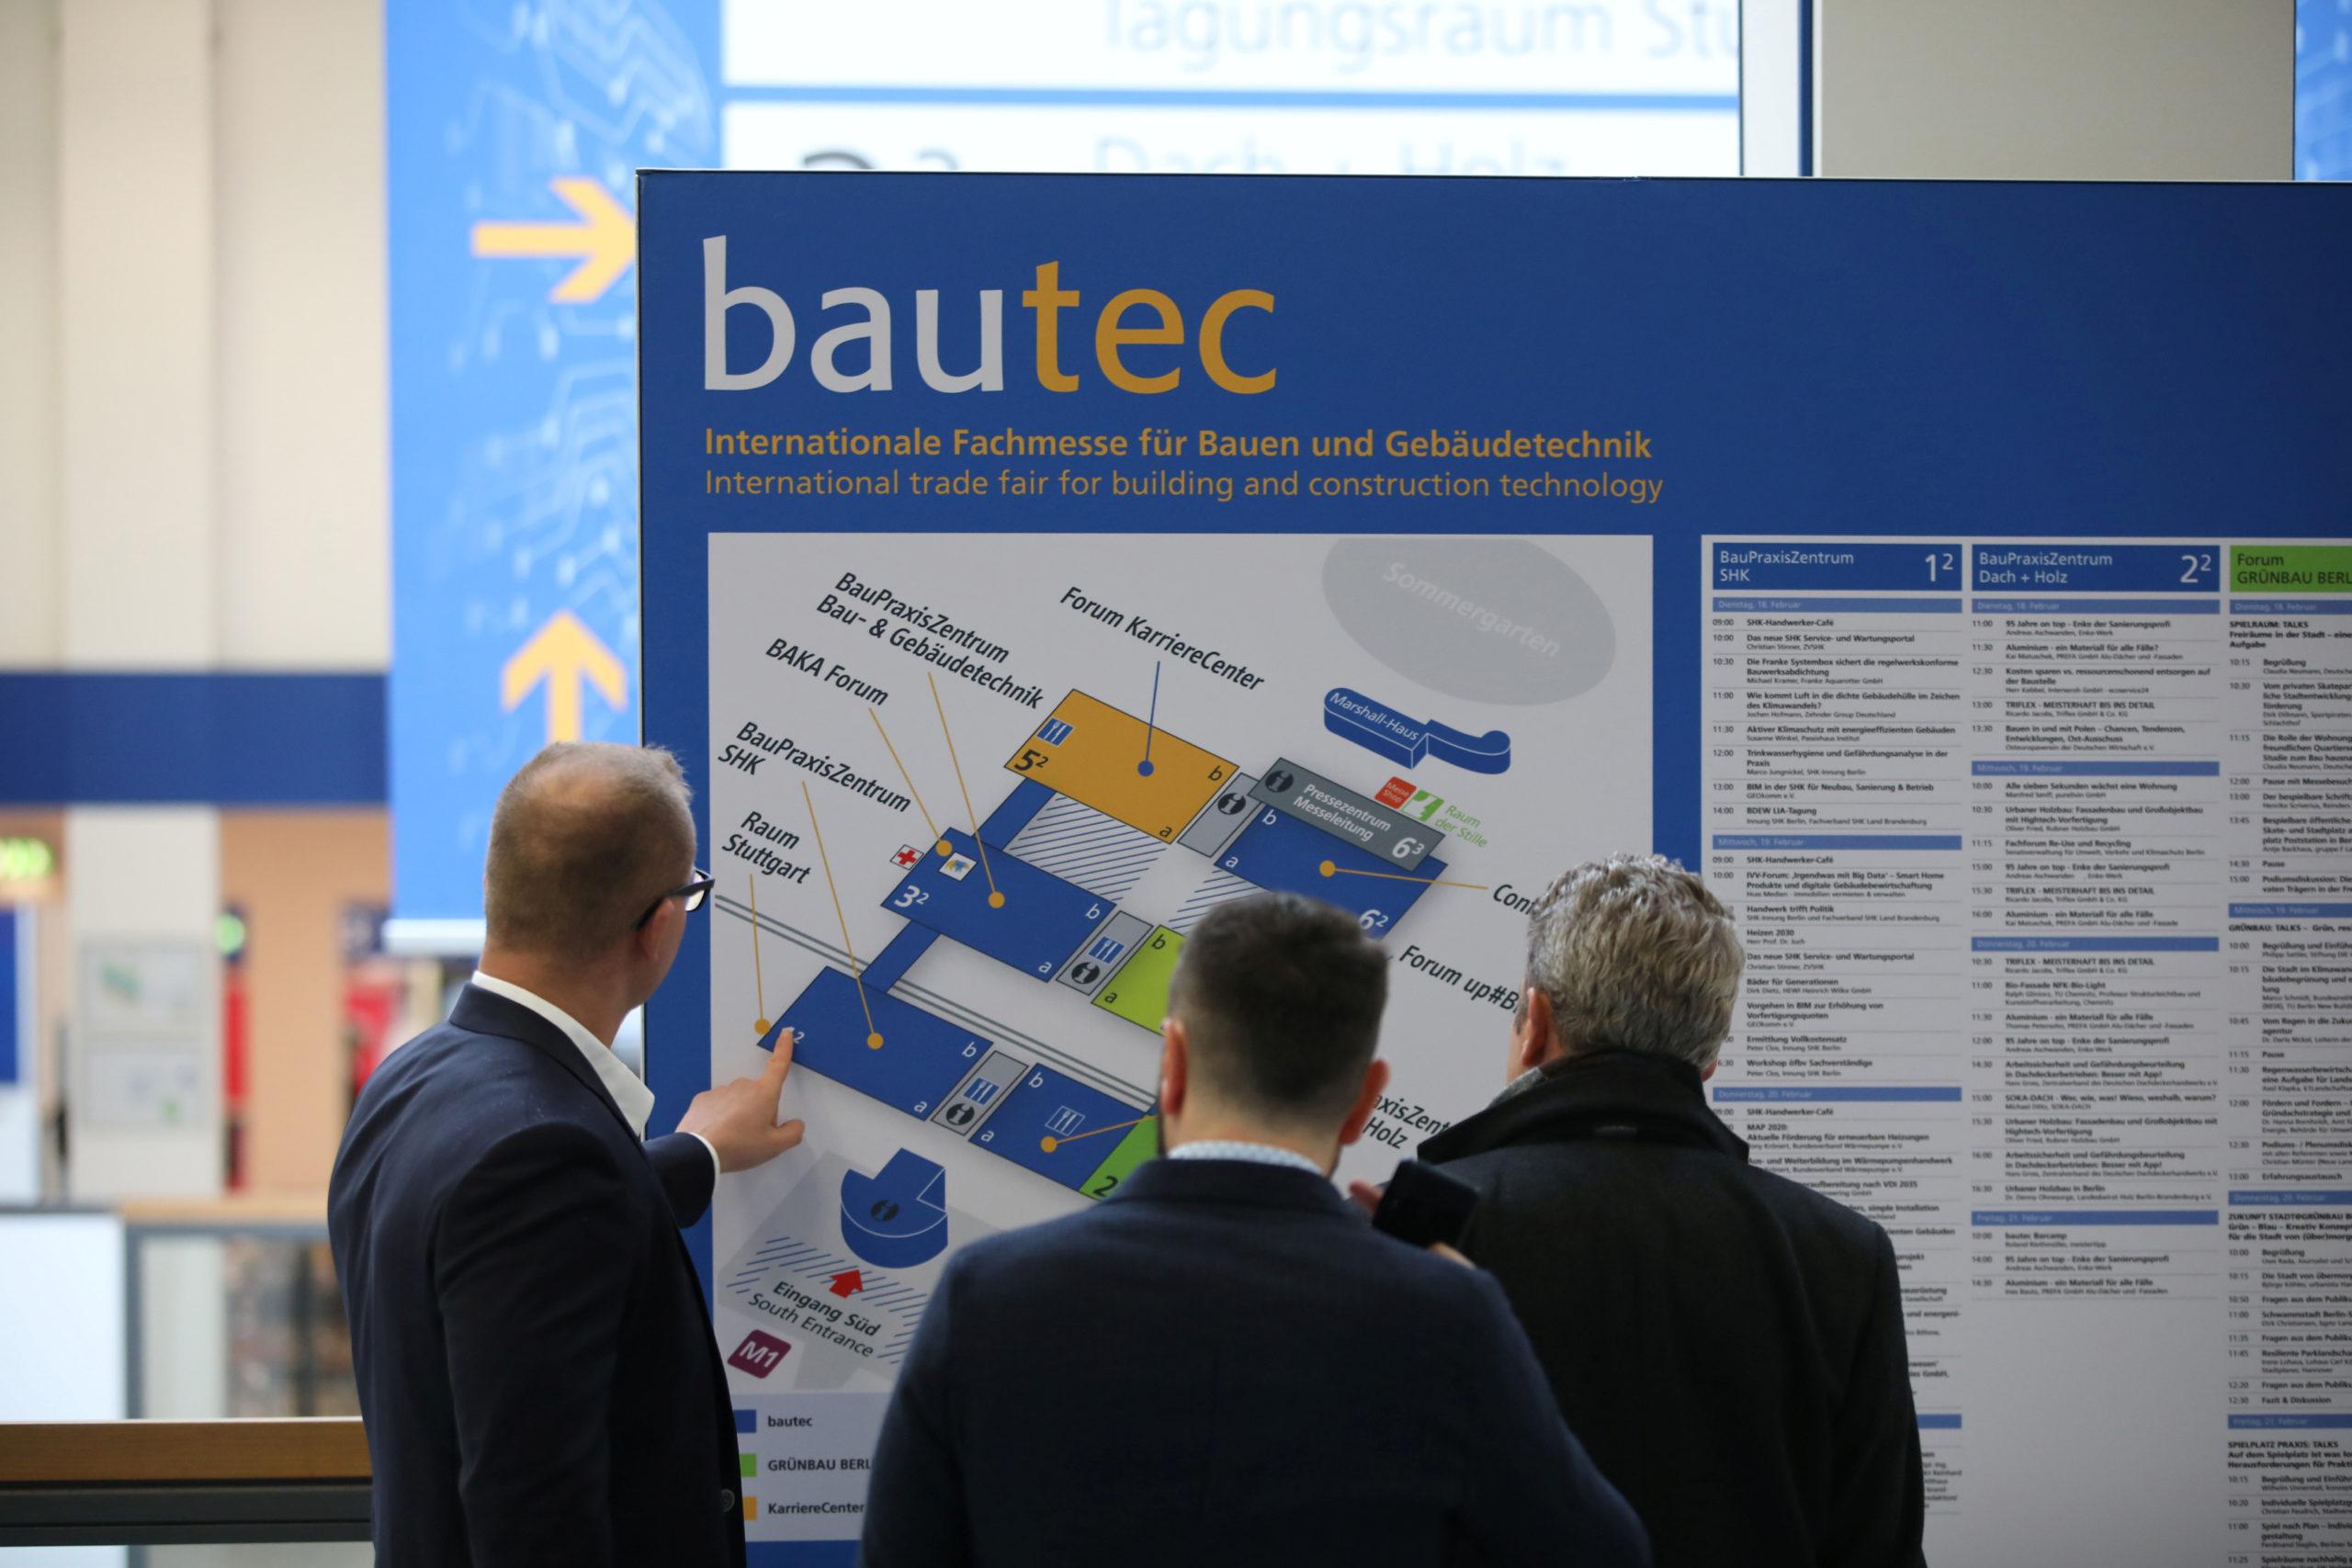 bautec in 2020 (Foto: Messe Berlin)